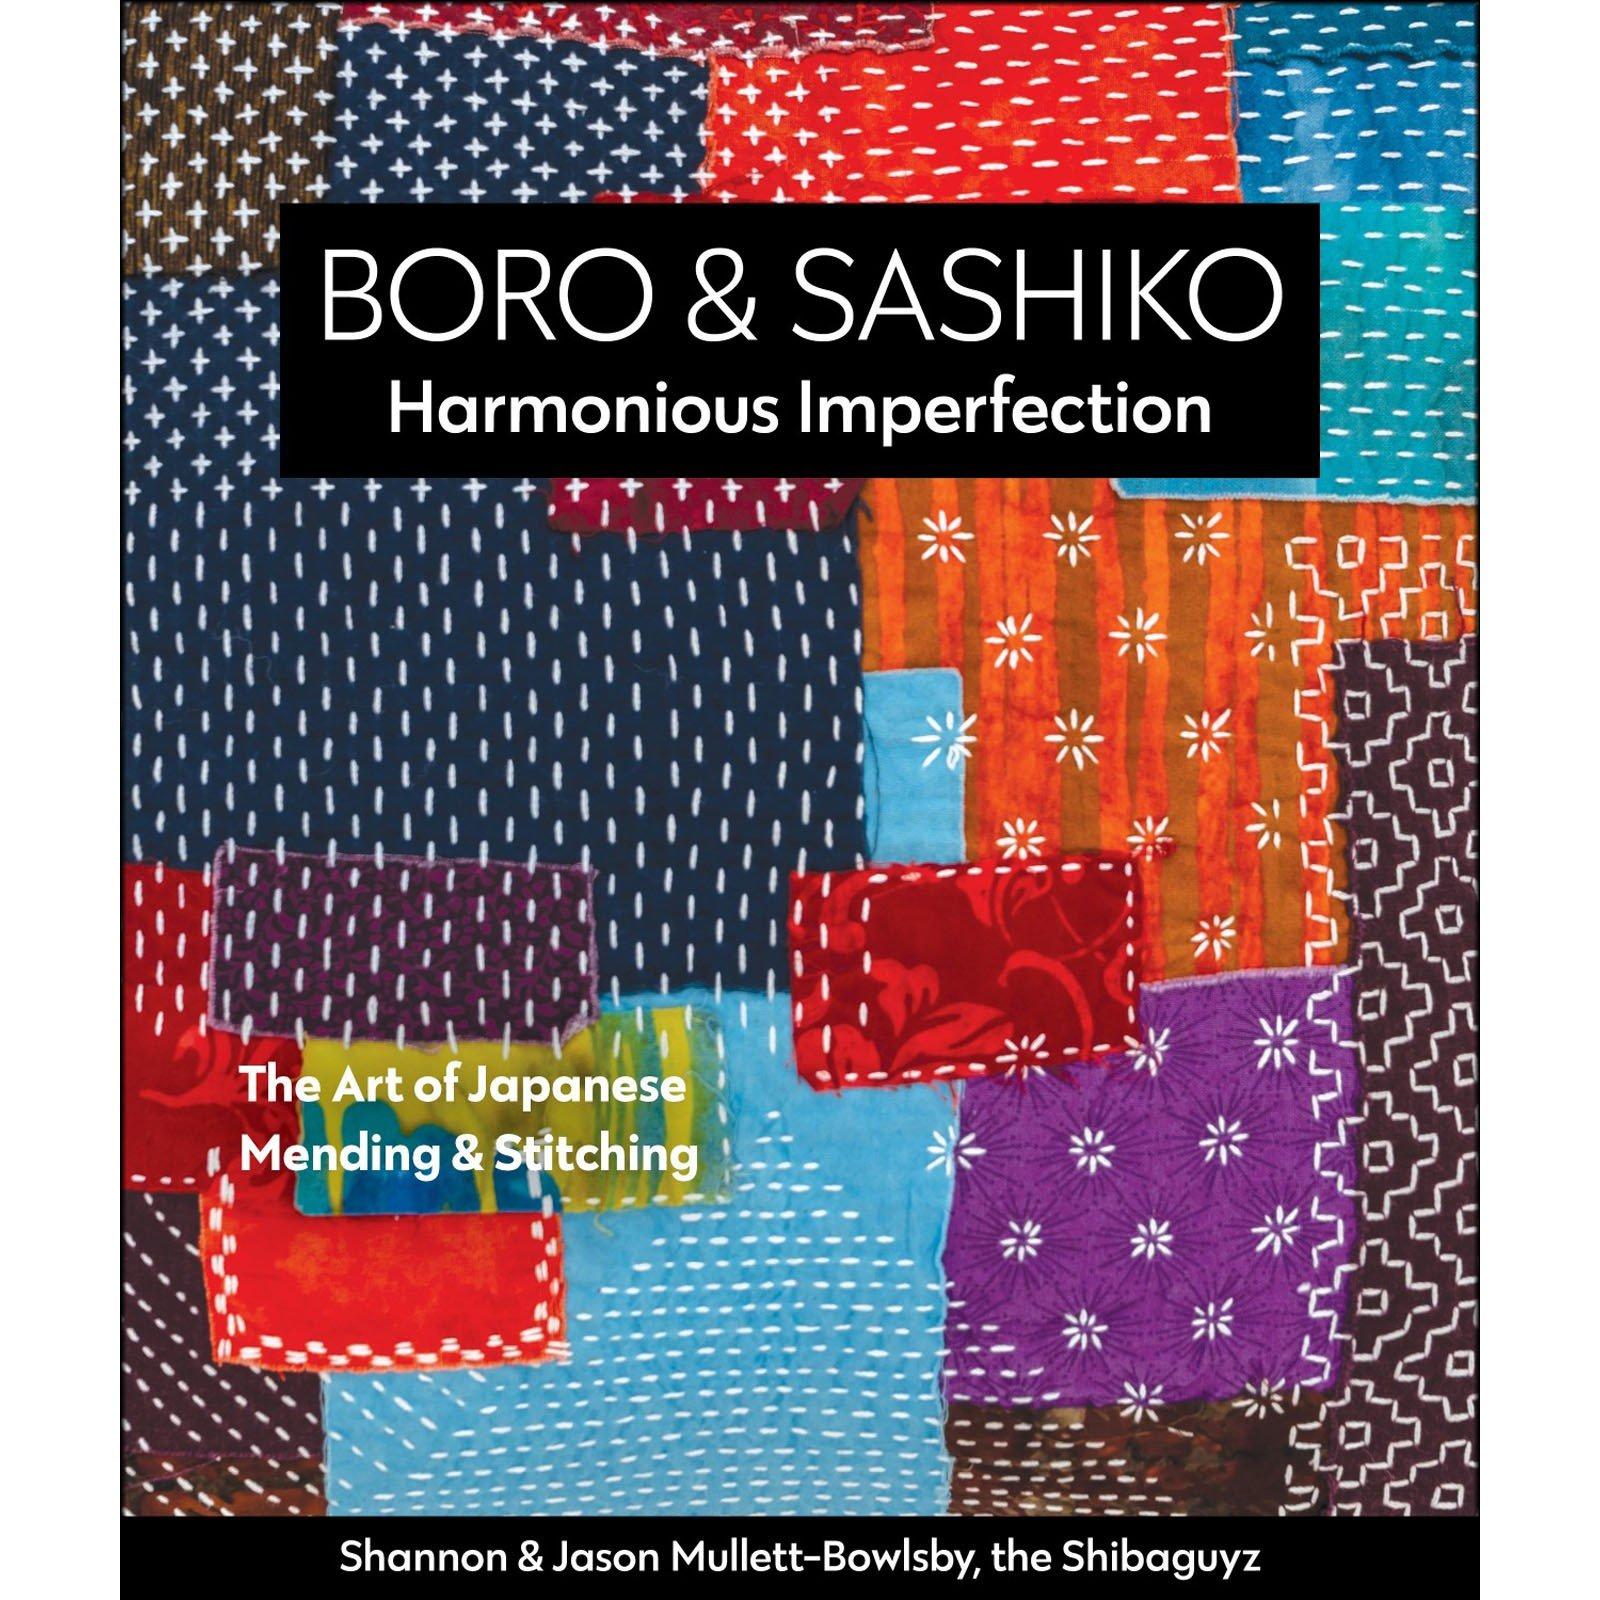 Shannon & Jason Mullett-Bowlsby - Boro & Sashiko - Book 11379